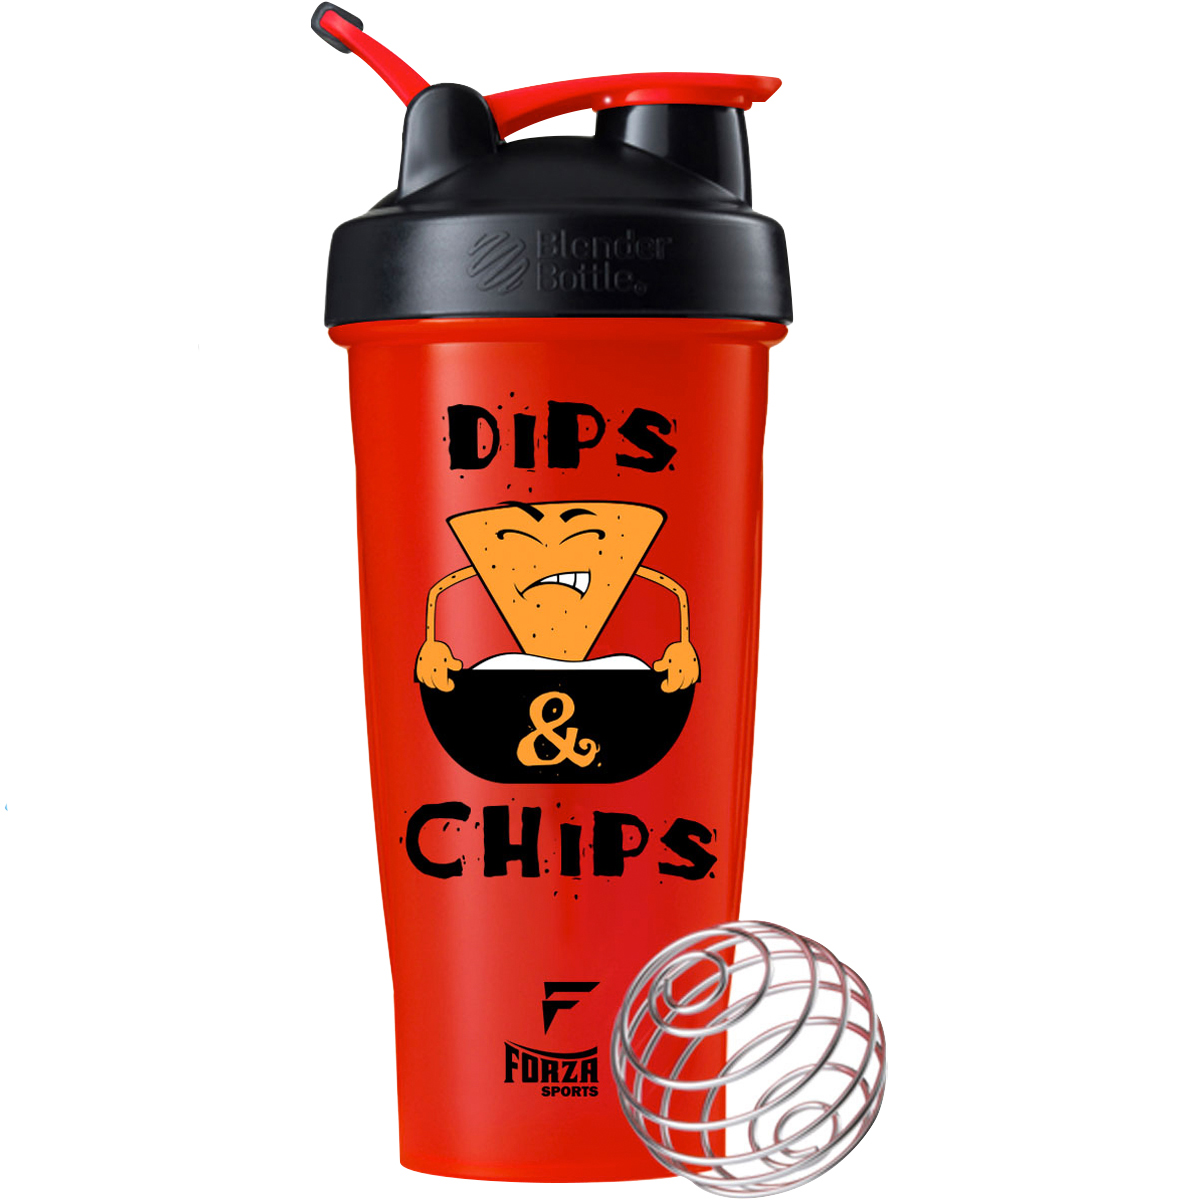 Chips & Dips - Red/Black